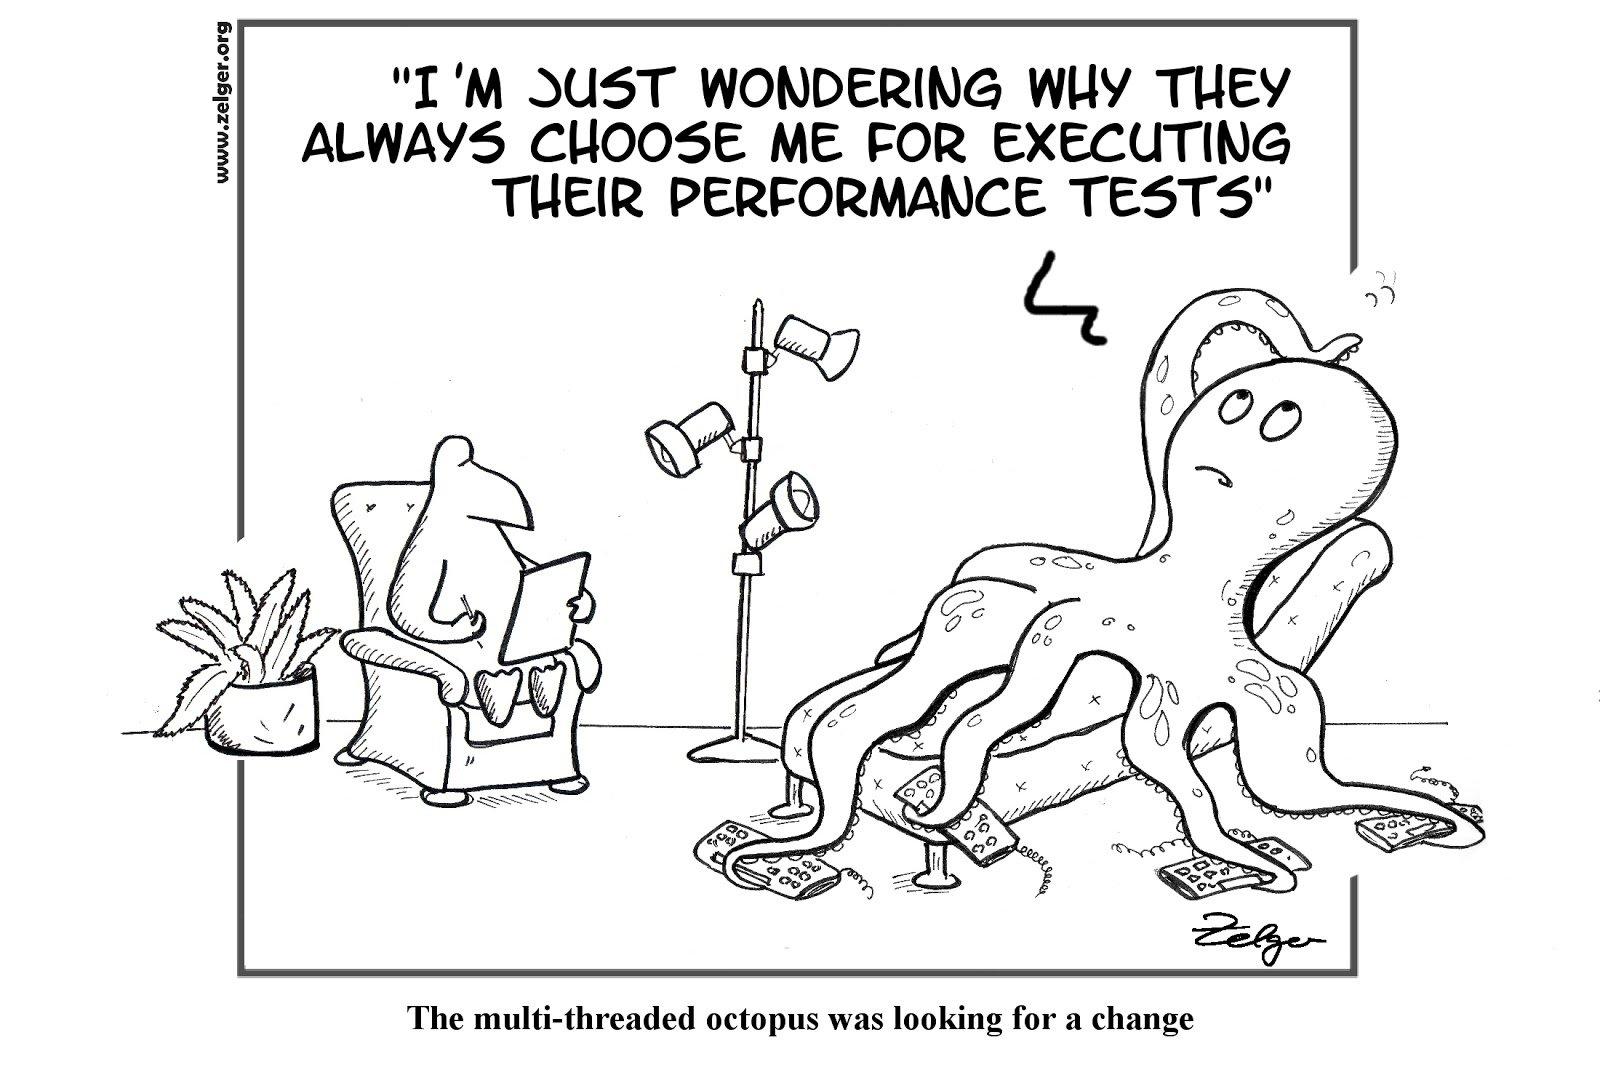 1000+ images about Software Development Jokes on Pinterest